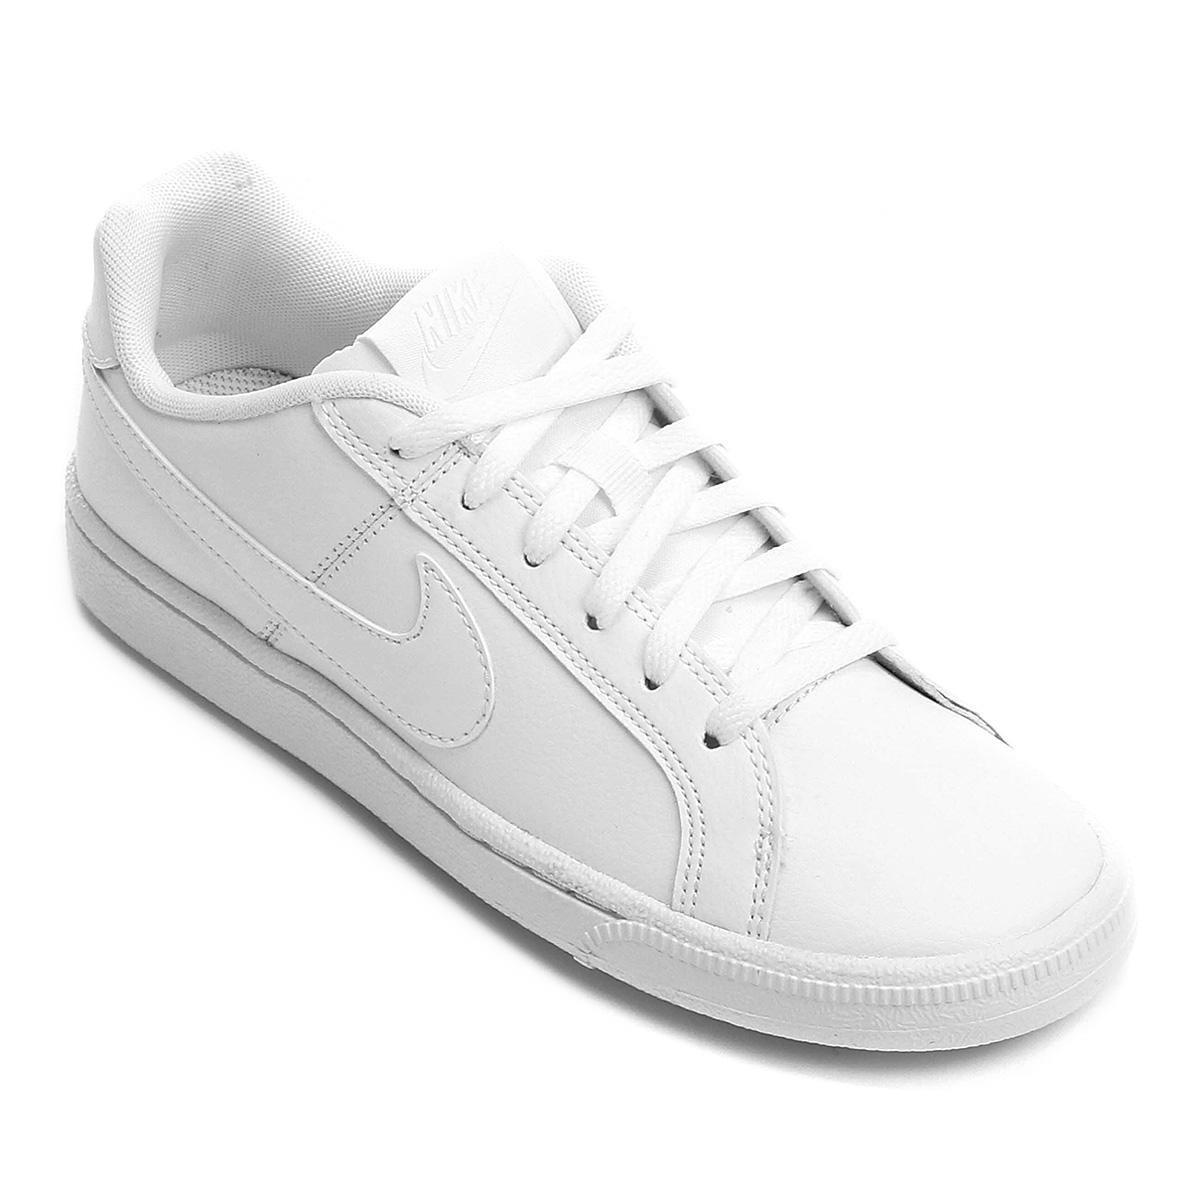 6bd2c6e2284 tênis nike feminino court royale - branco. Carregando zoom.